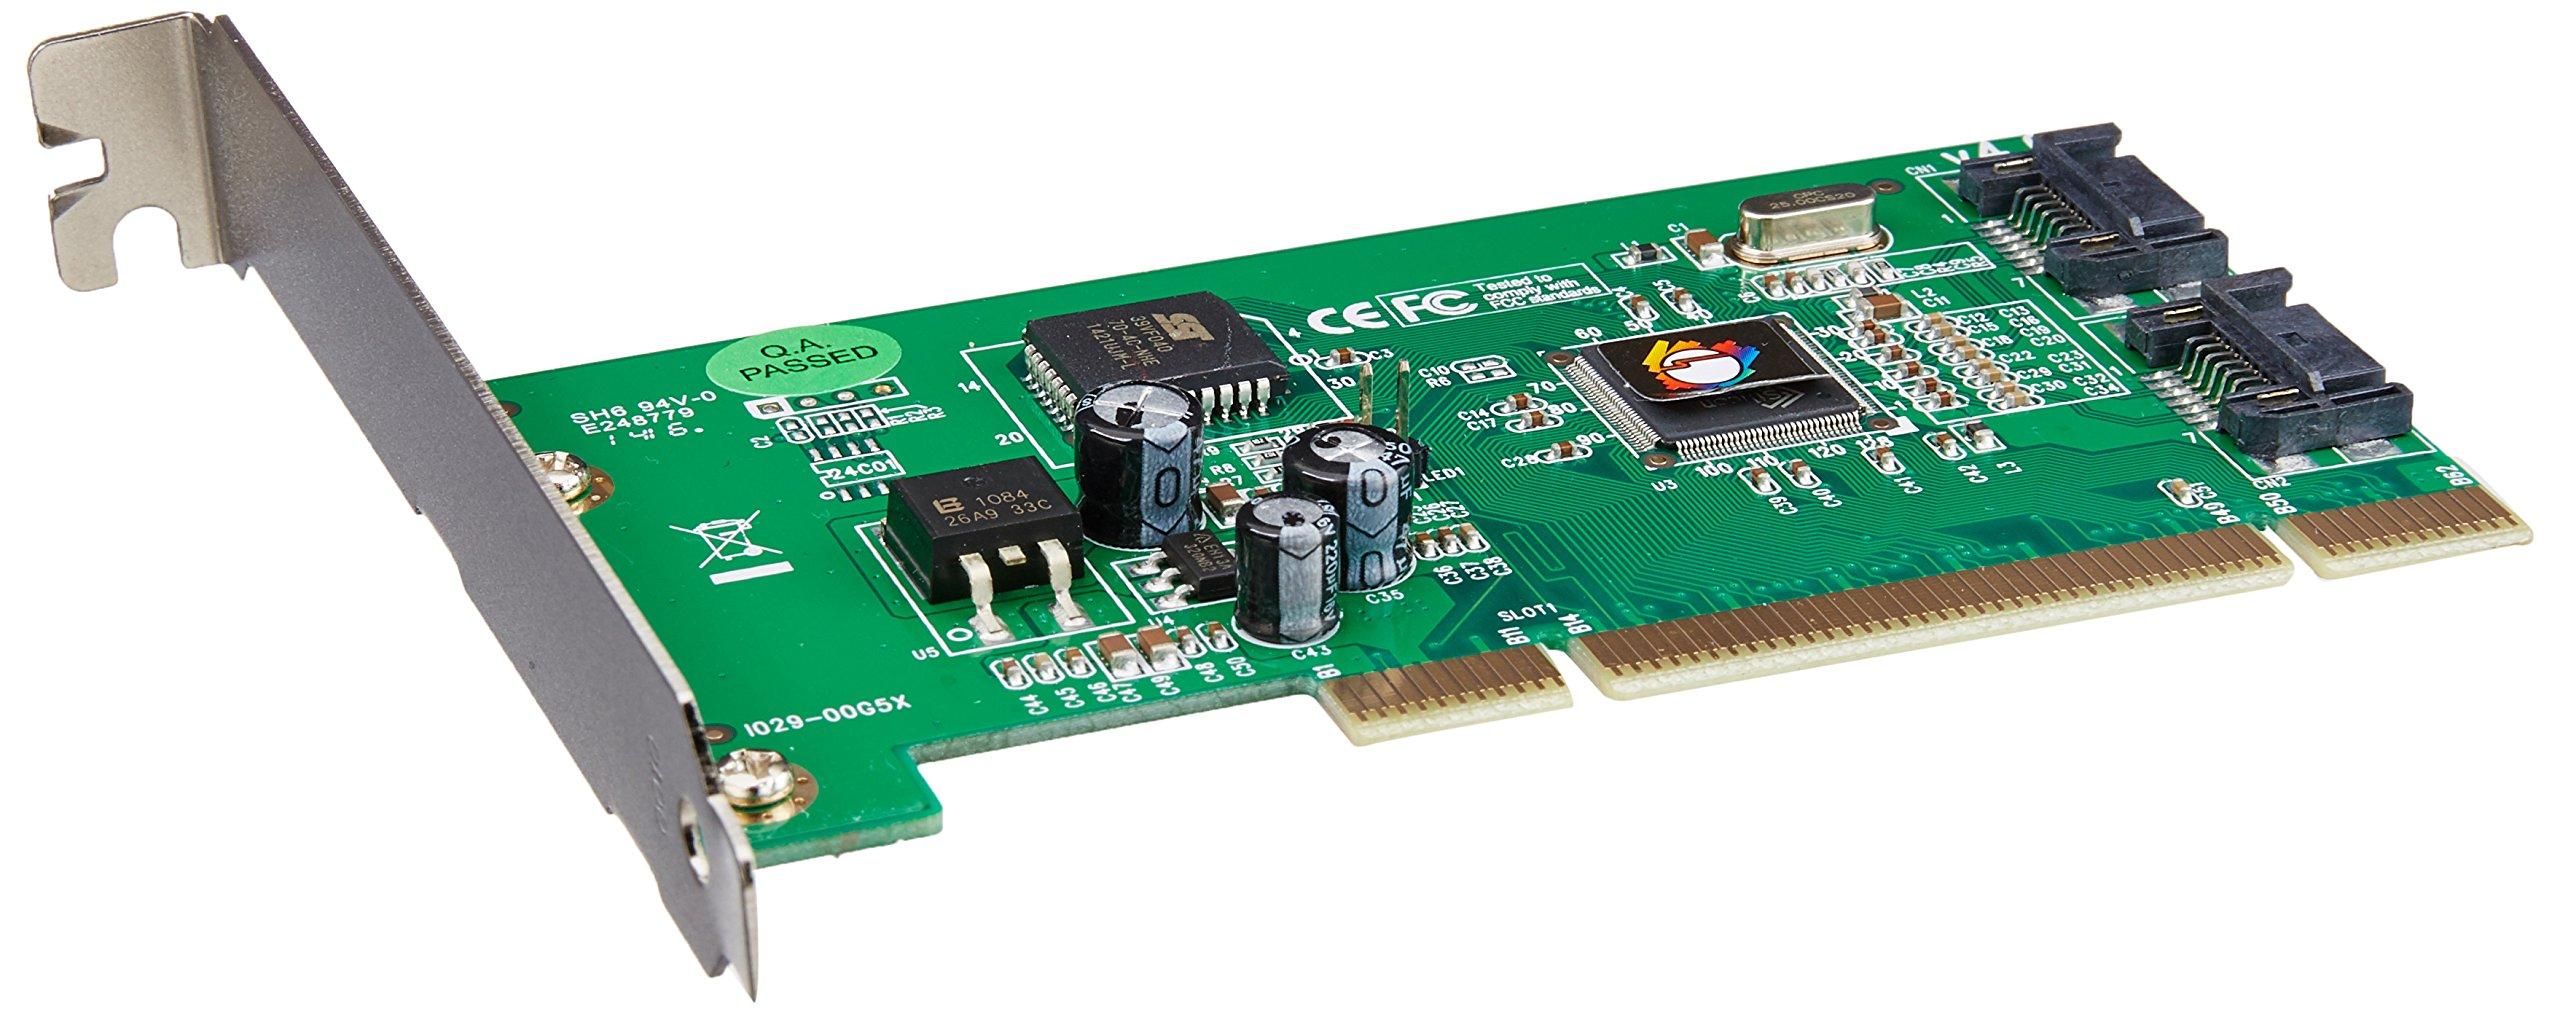 SIIG Serial ATA PCI (SC-SAT212-S4) by SIIG